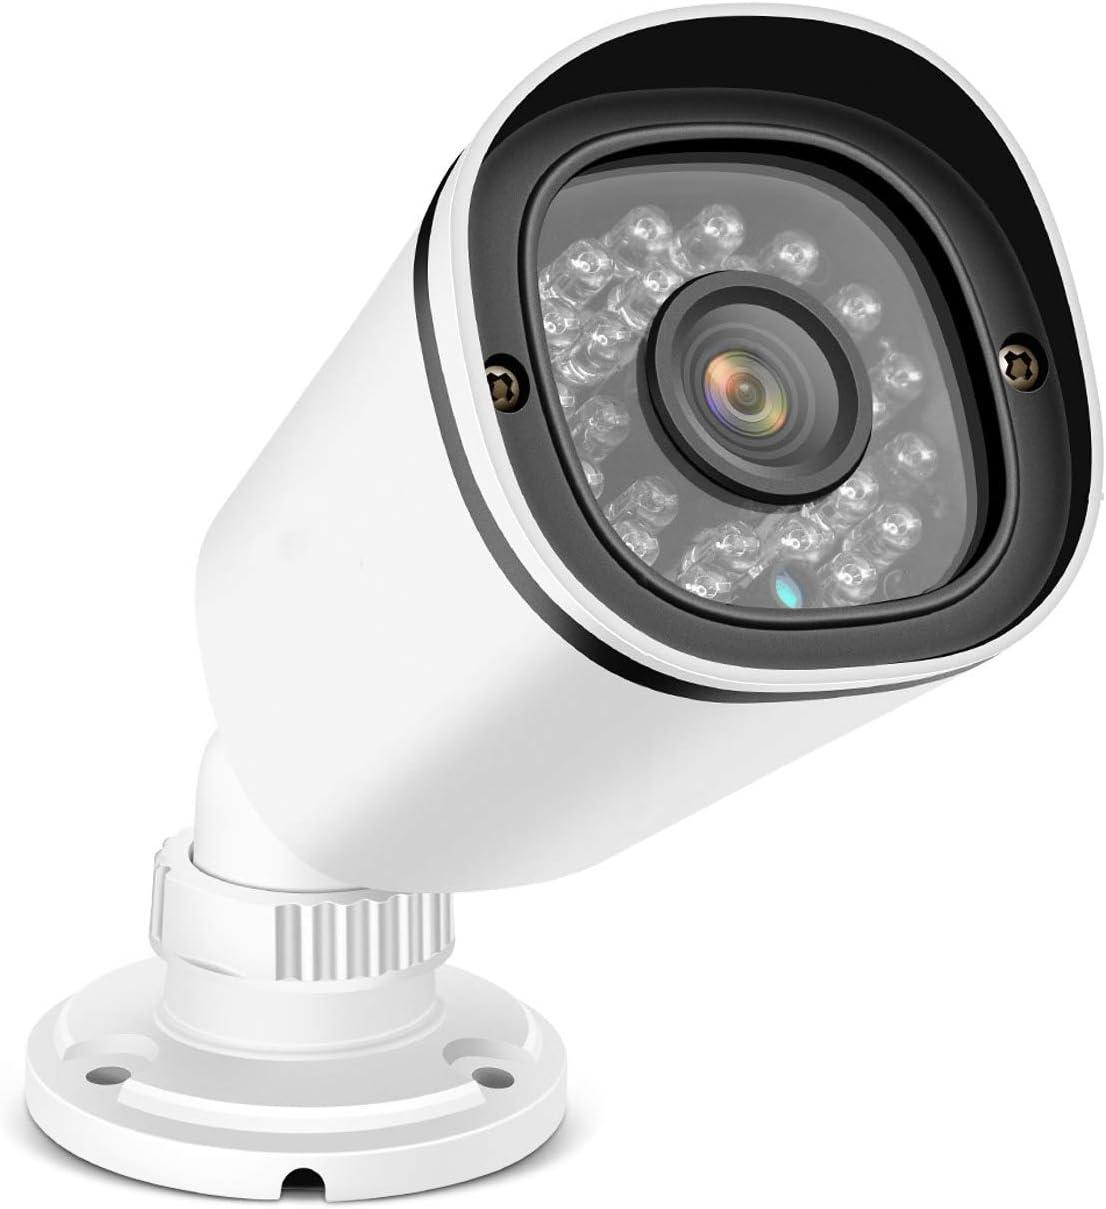 2.0MP 1080P Home Security Camera HD CCTV Camera 24PCS IR-LEDs 100ft Night Vision Waterproof Surveillance Camera AHD and 960H CVBS Analog DVR CVI Aluminum Metal Housing for HD-TVI